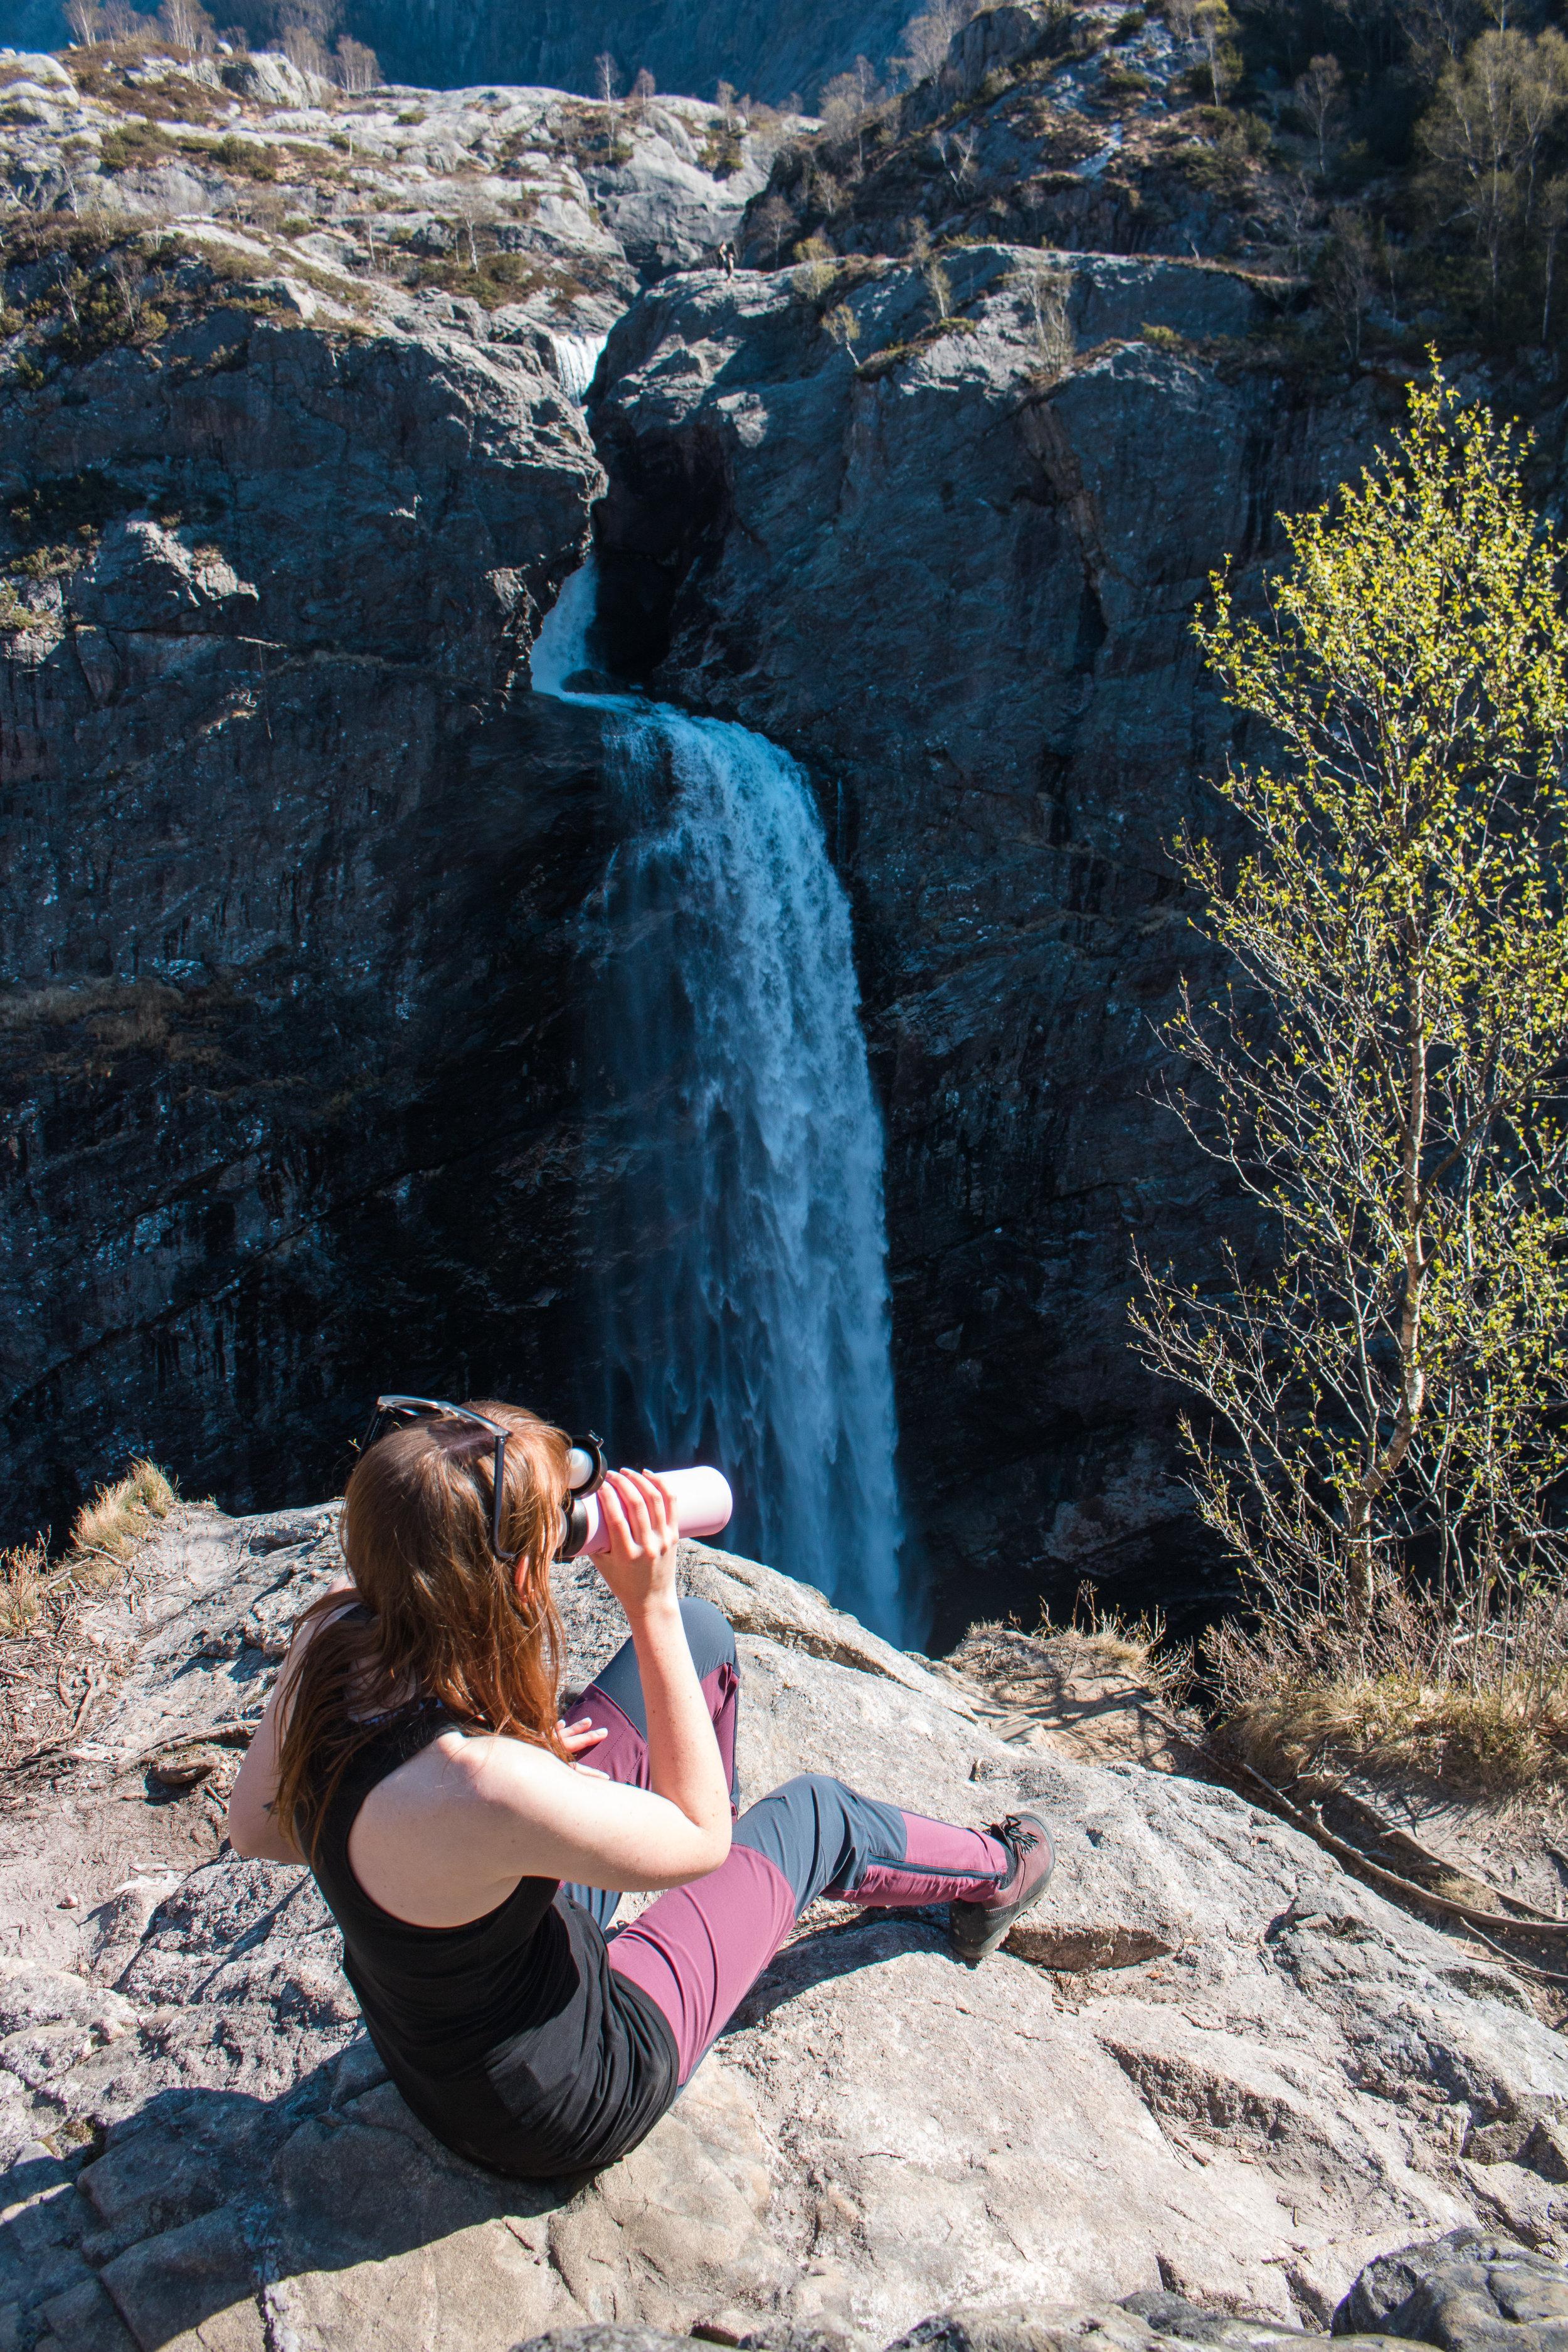 månafossen waterfall norway